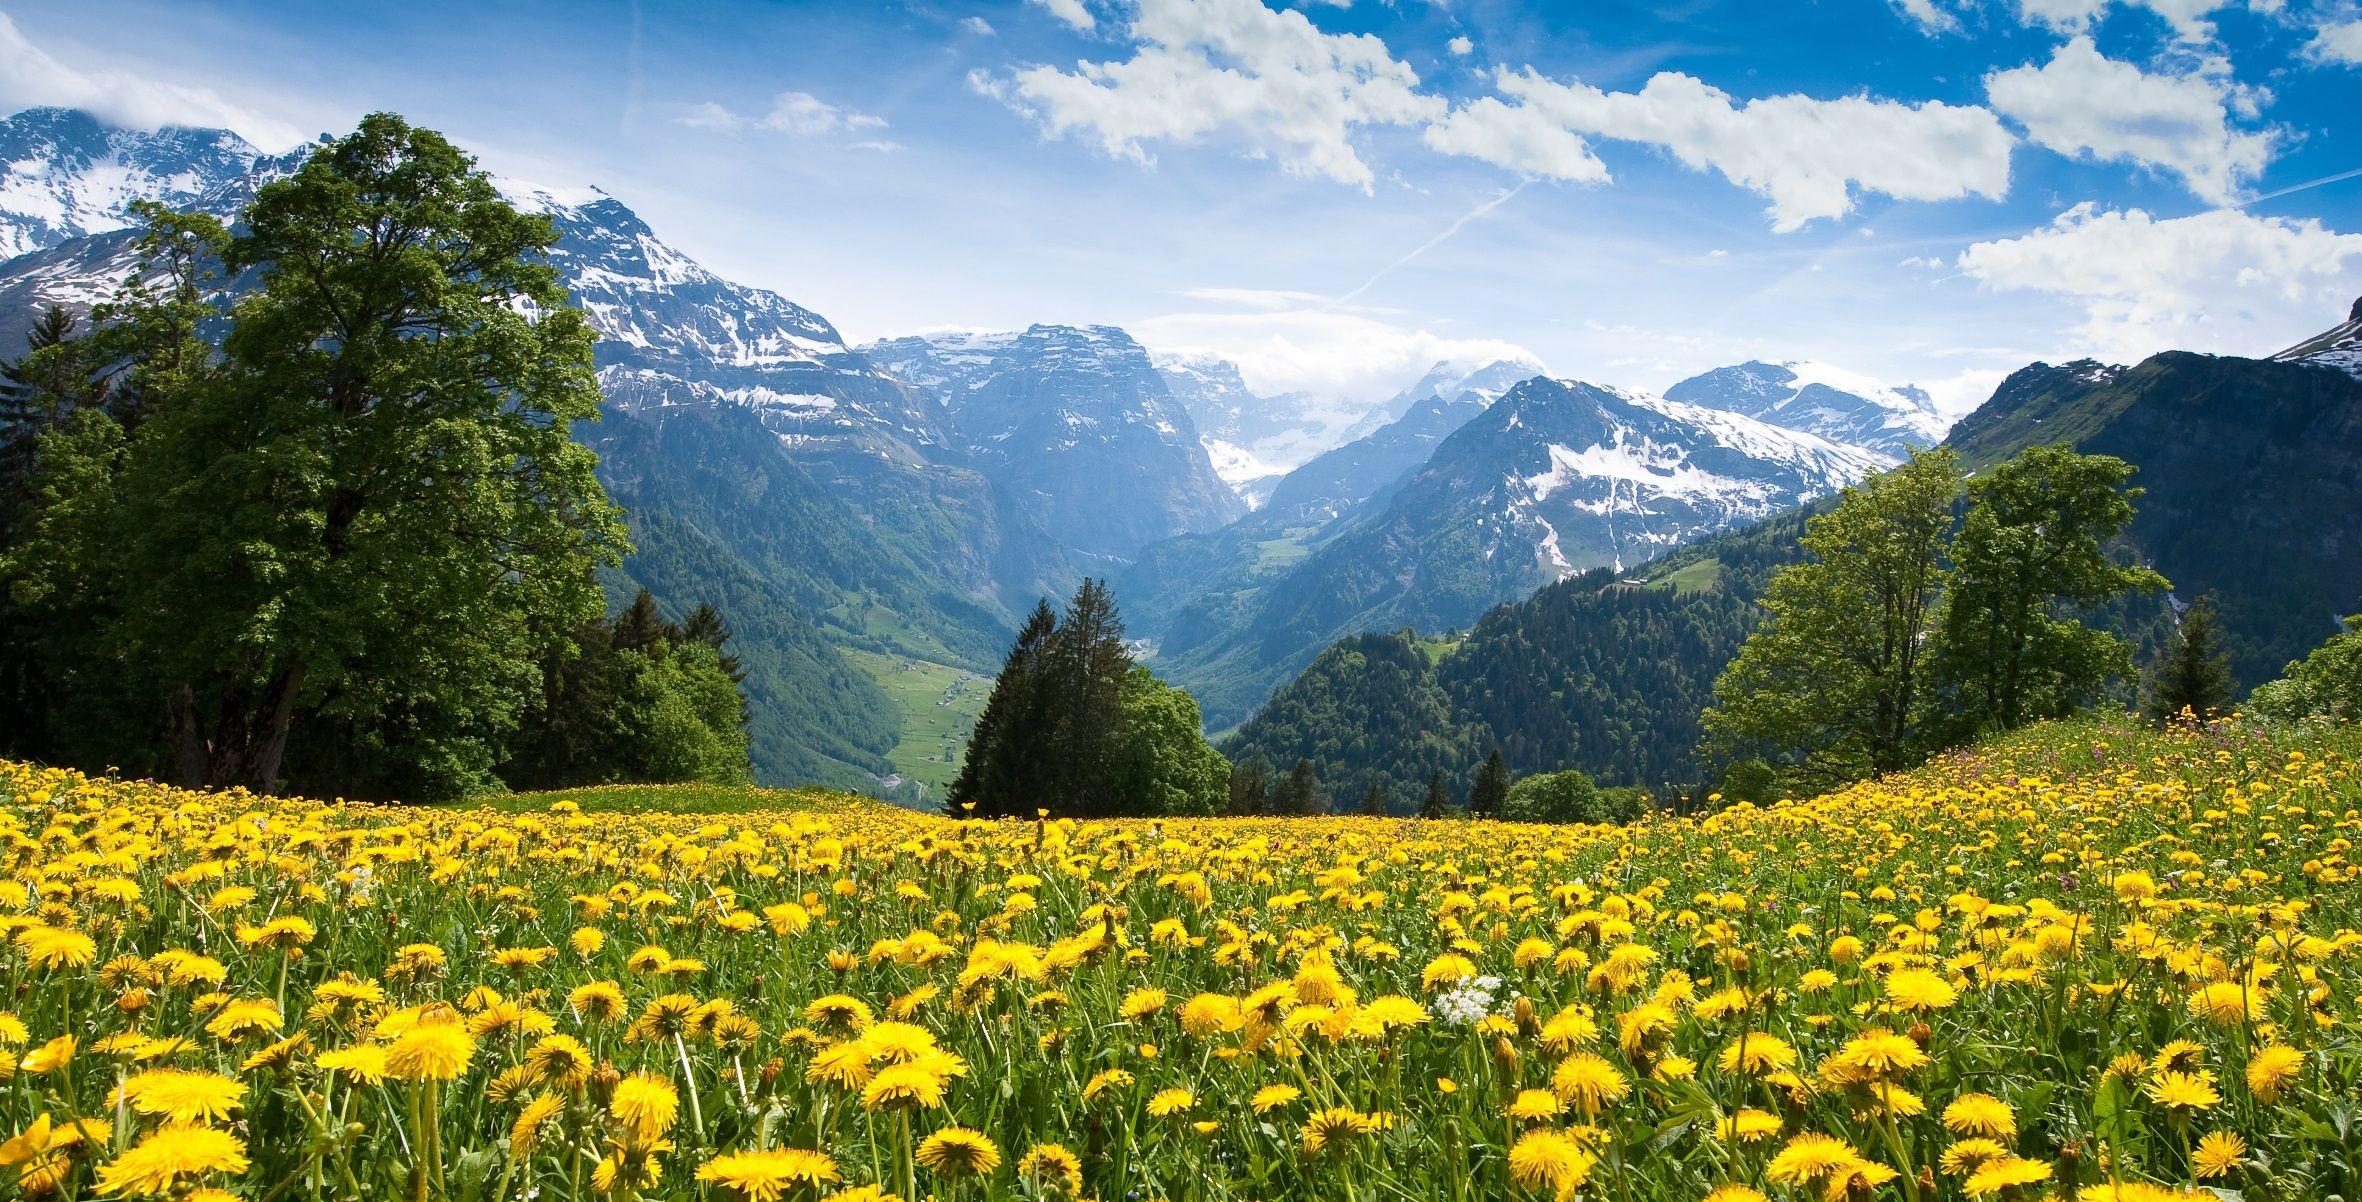 Vacanze in montagna anthropos magazine for Vacanze in montagna